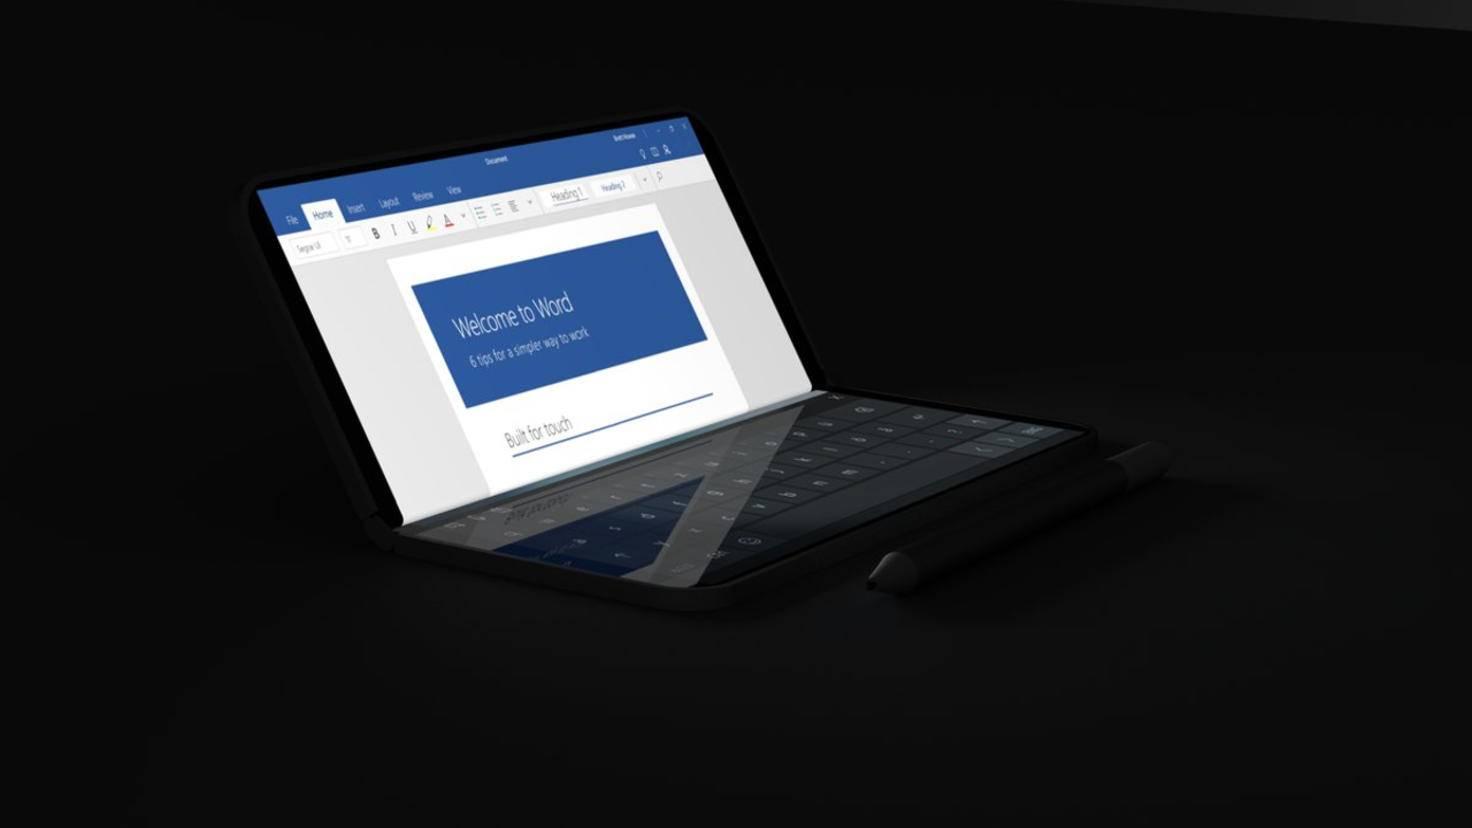 Das Surface Phone im Laptop-Modus.